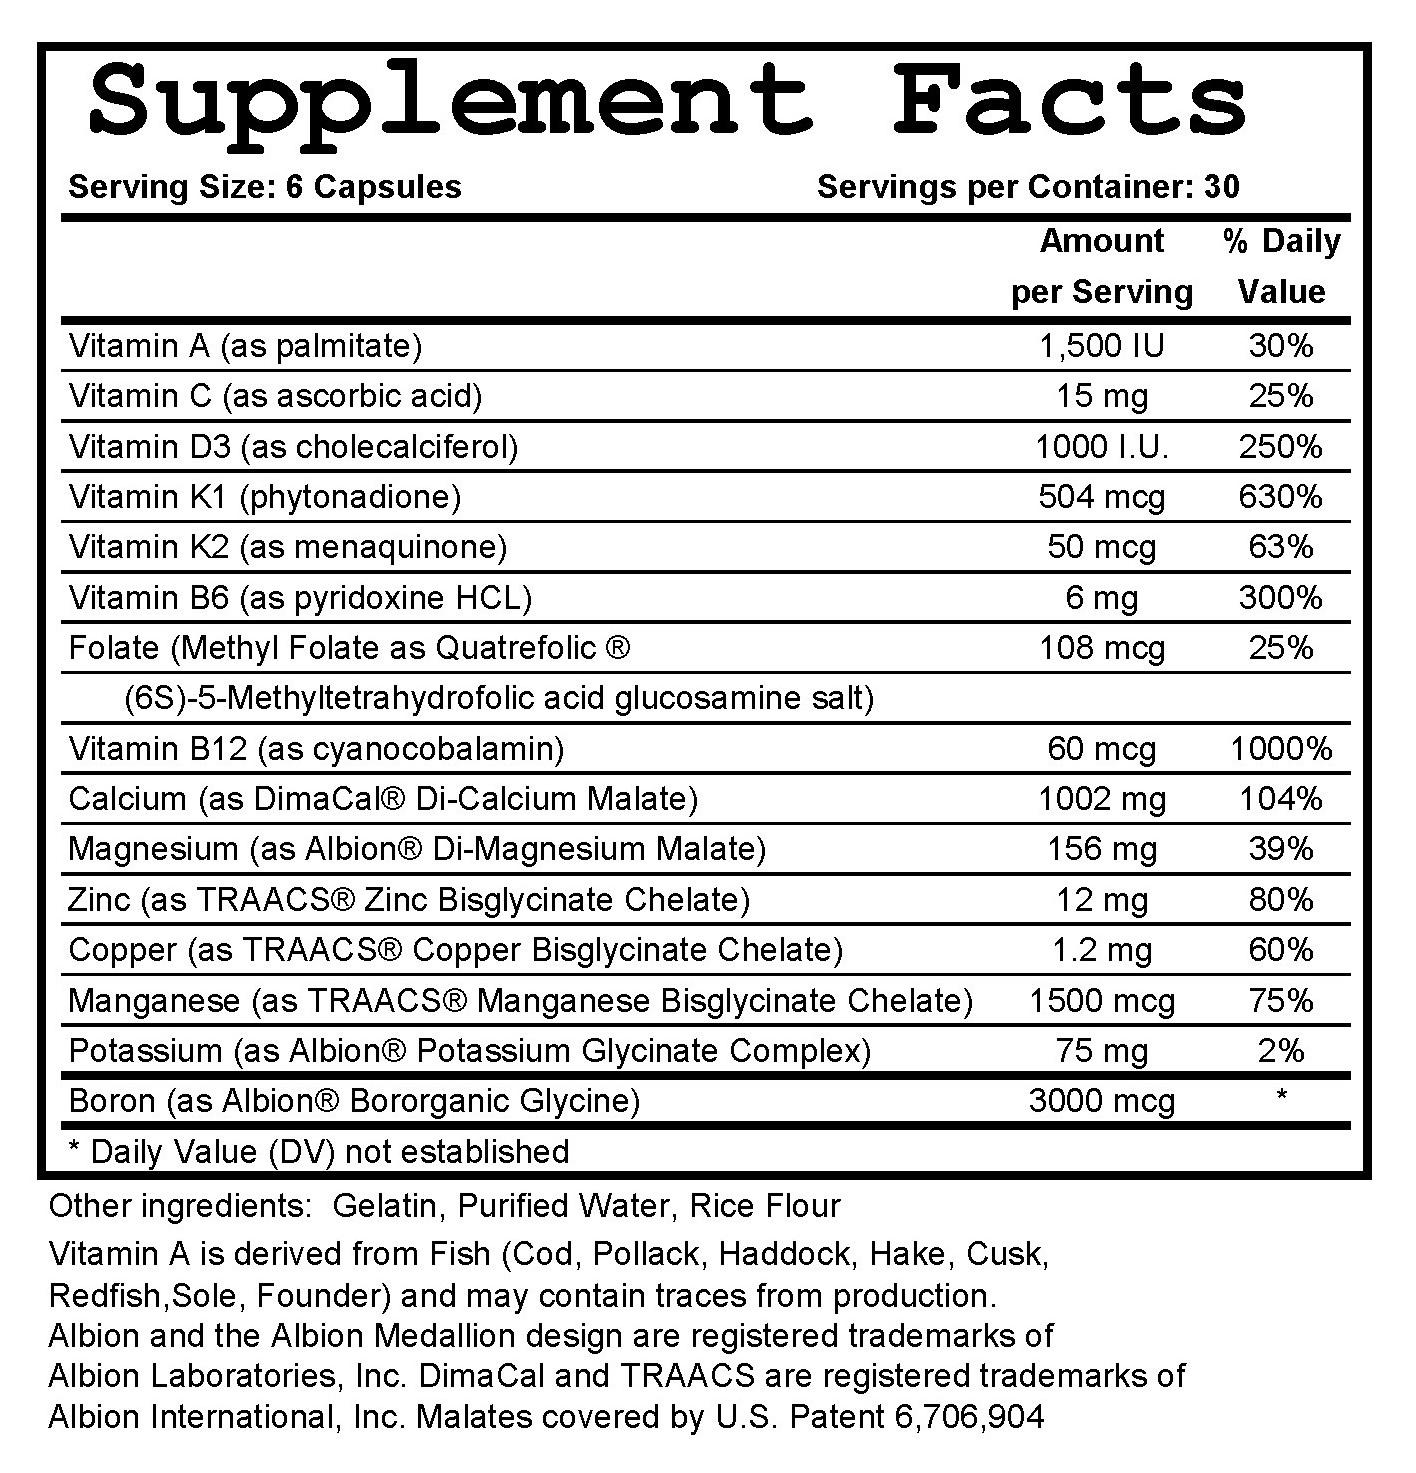 CalciumComplete_ingredients